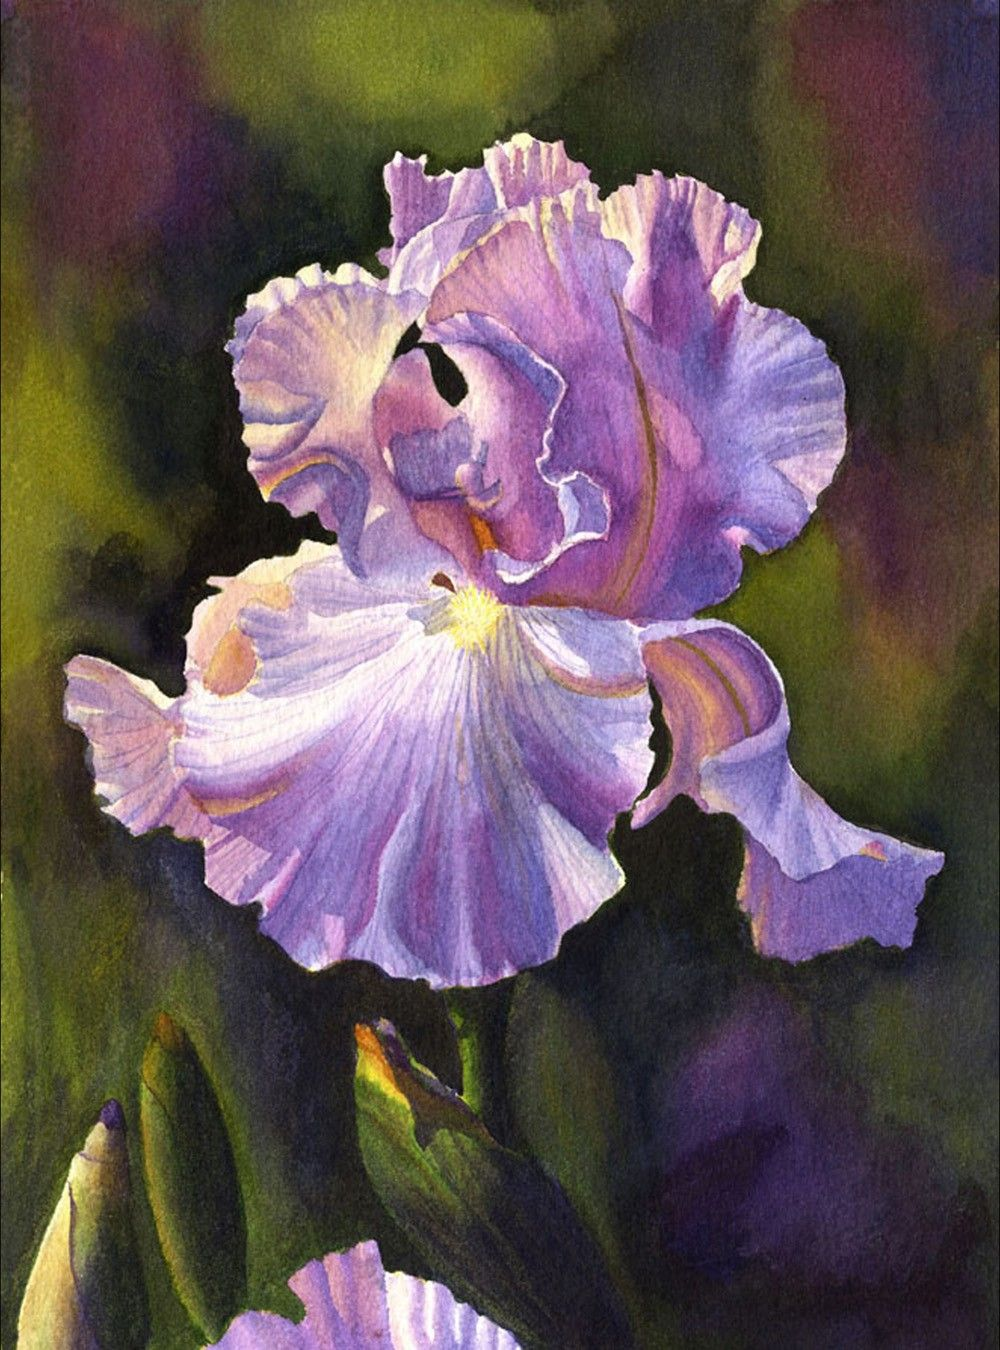 Purple iris art watercolor painting print by cathy hillegas purple iris art watercolor painting print by cathy hillegas floral flower 8x10 2000 via etsy izmirmasajfo